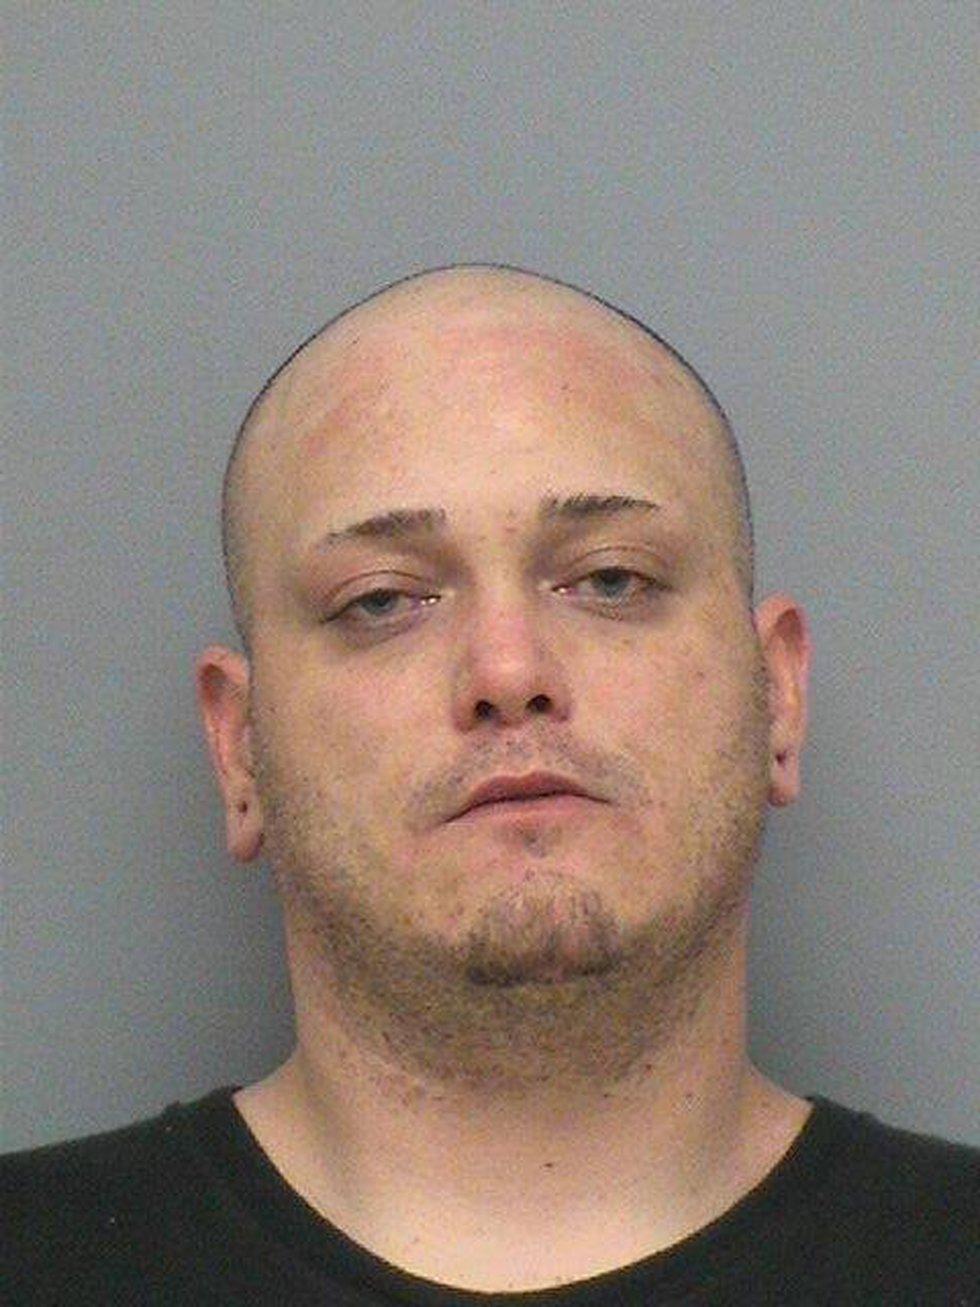 Chad Davis (Source: Mt. Vernon Police Department)